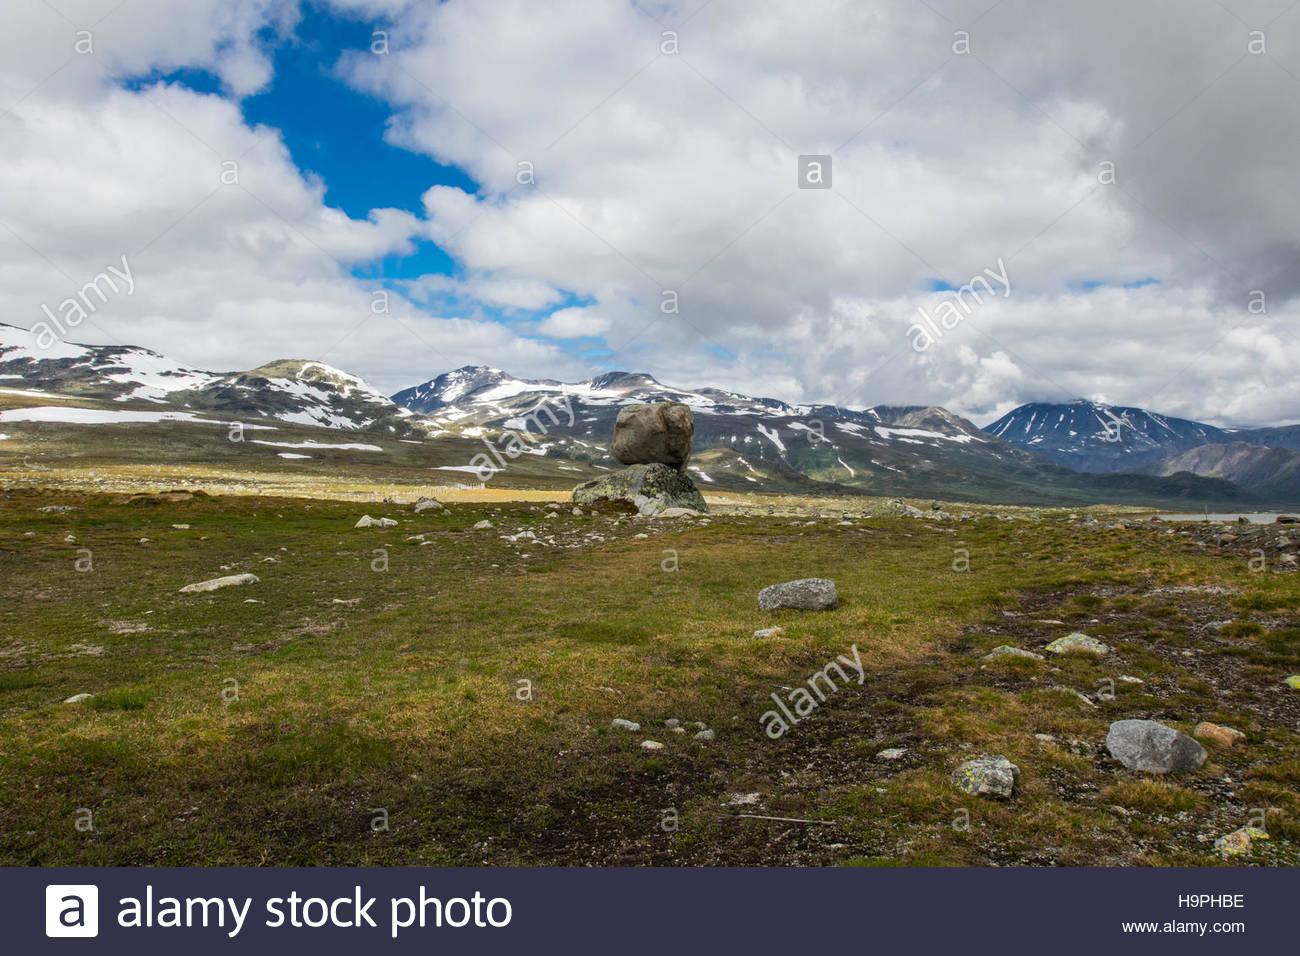 look from fylkesvei 51 to jotunheimen national park, oppland, norway, july 2016 - Stock Image